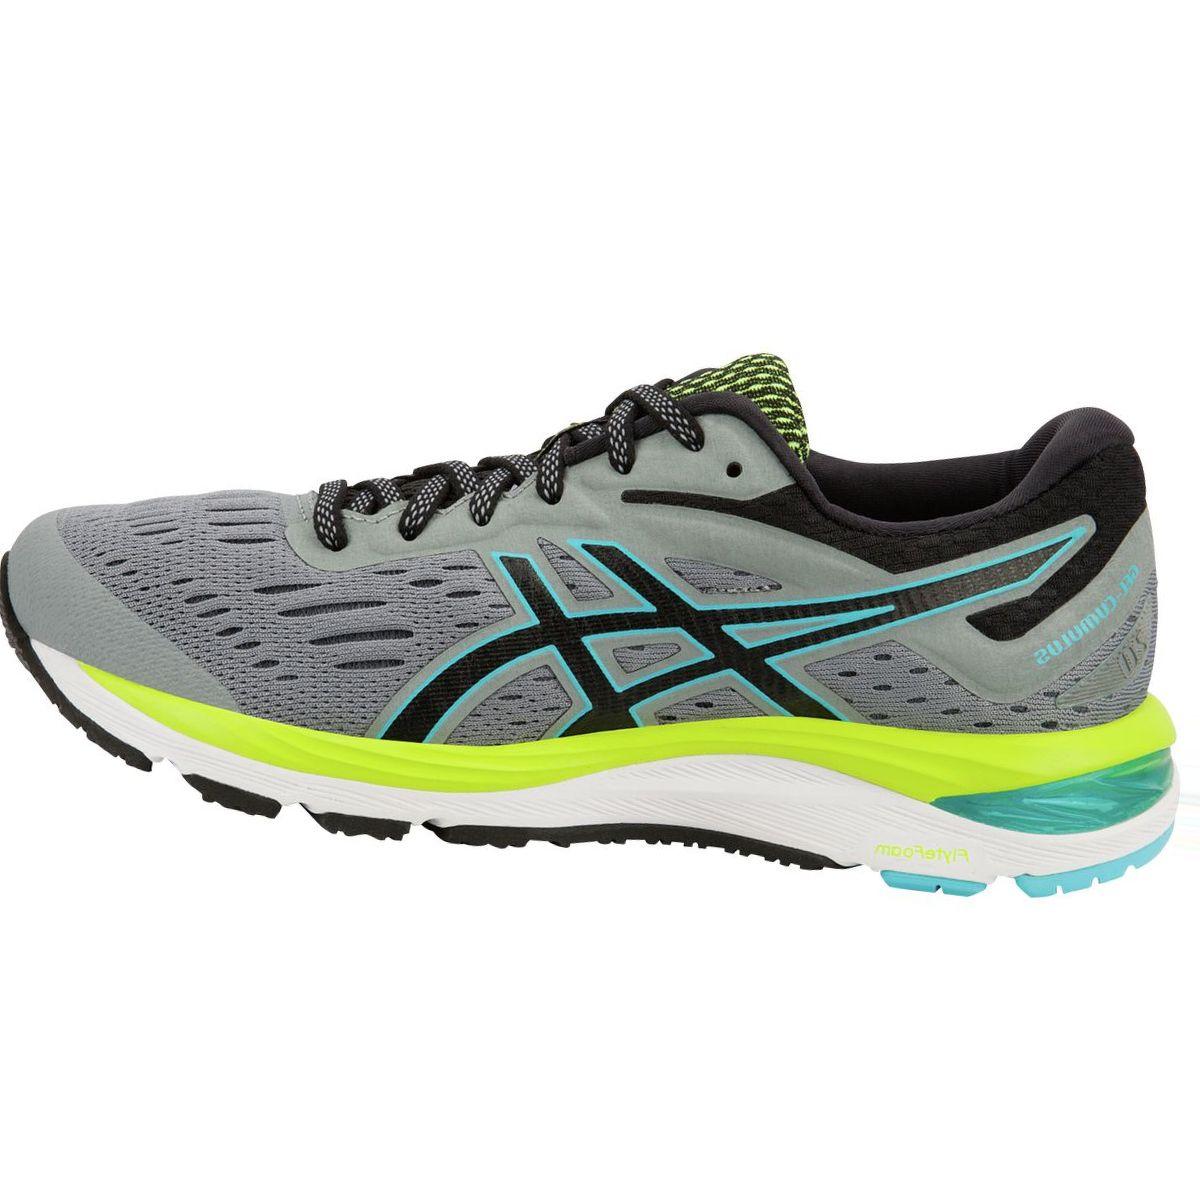 Asics Gel-Cumulus 20 Running Shoe - Women's